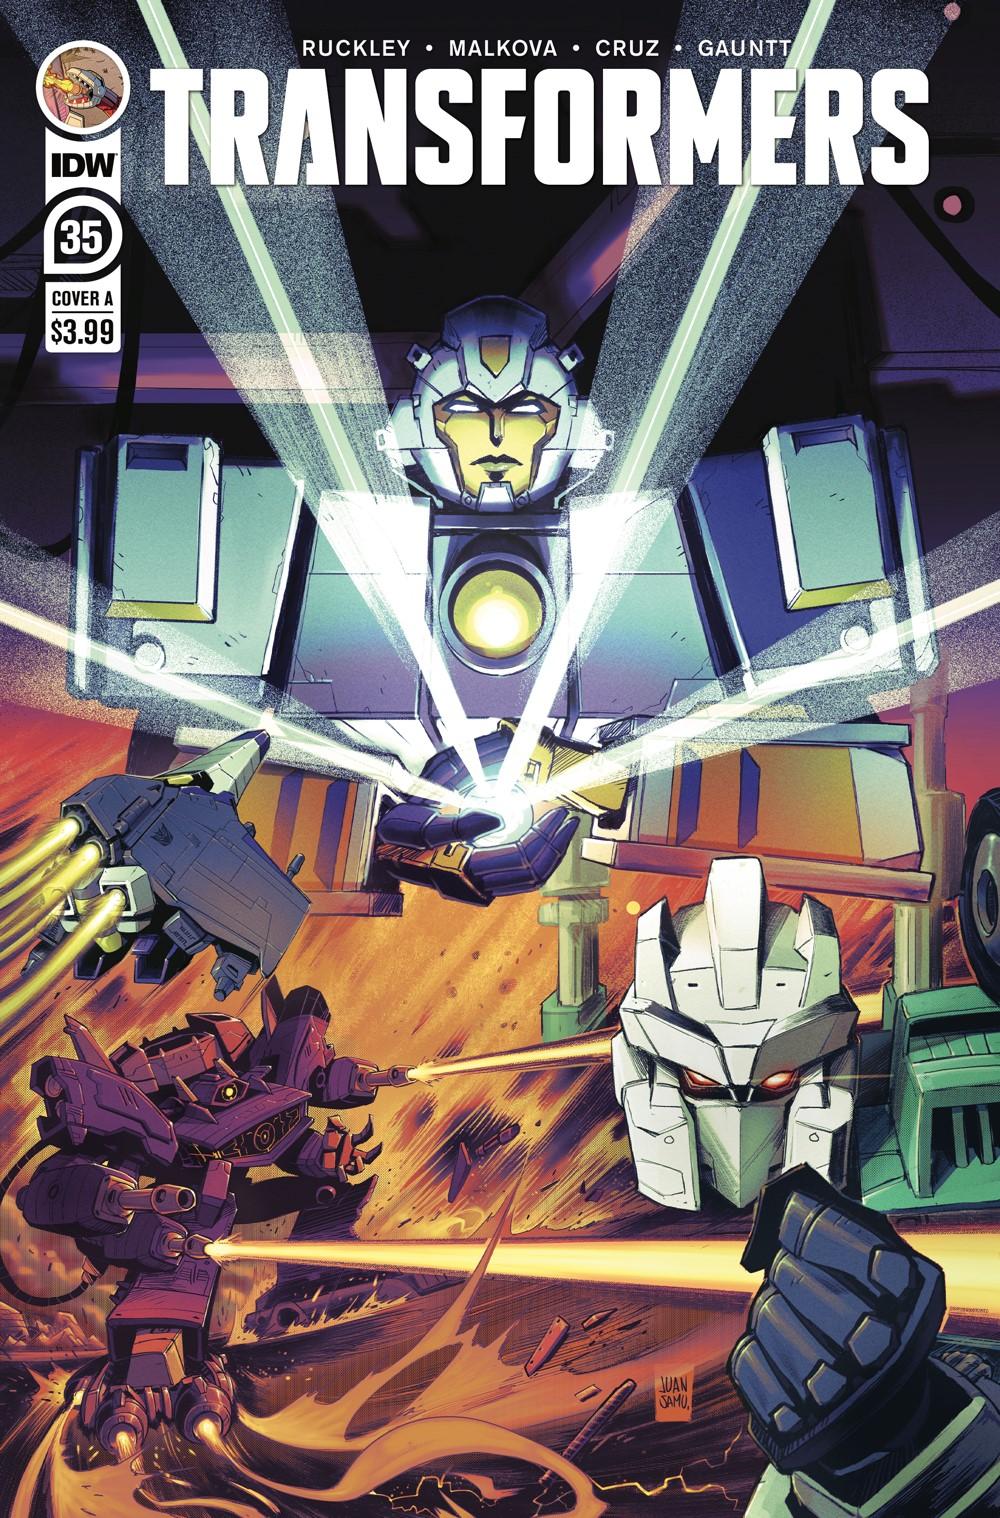 TF35-cvr-A ComicList Previews: TRANSFORMERS #35